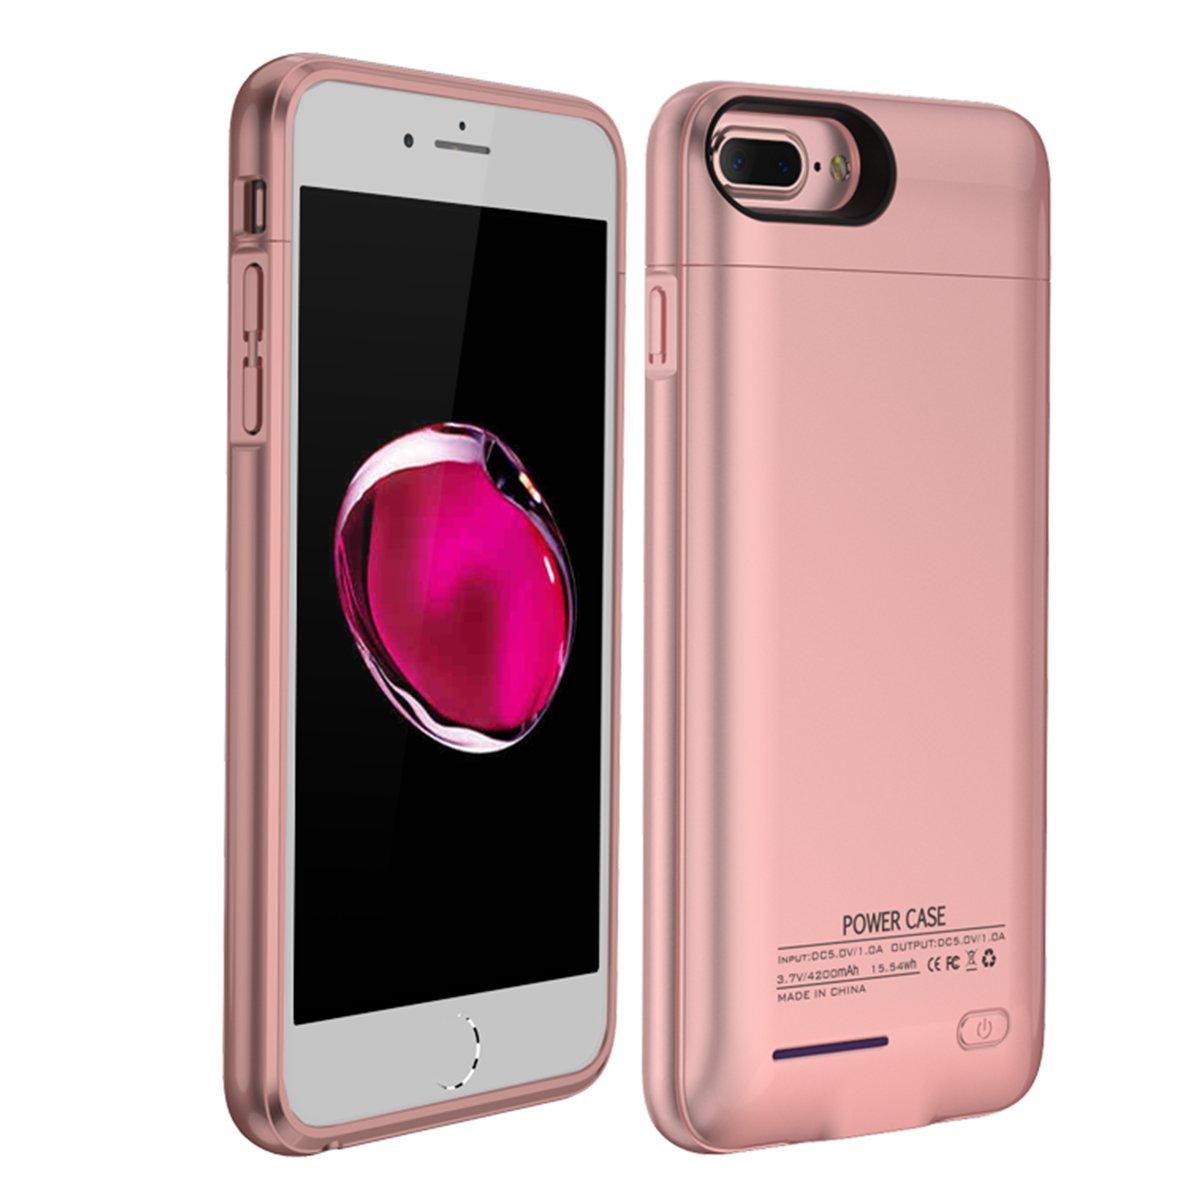 AICEDA iPhone 6 iPhone 6s 4.7 inch iPhone 7 iPhone 8 Battery Case, Battery Charger Battery Charger Case Cover, Battery Charger Battery Charging Case with Battery Charger Compatible with iPhone 6